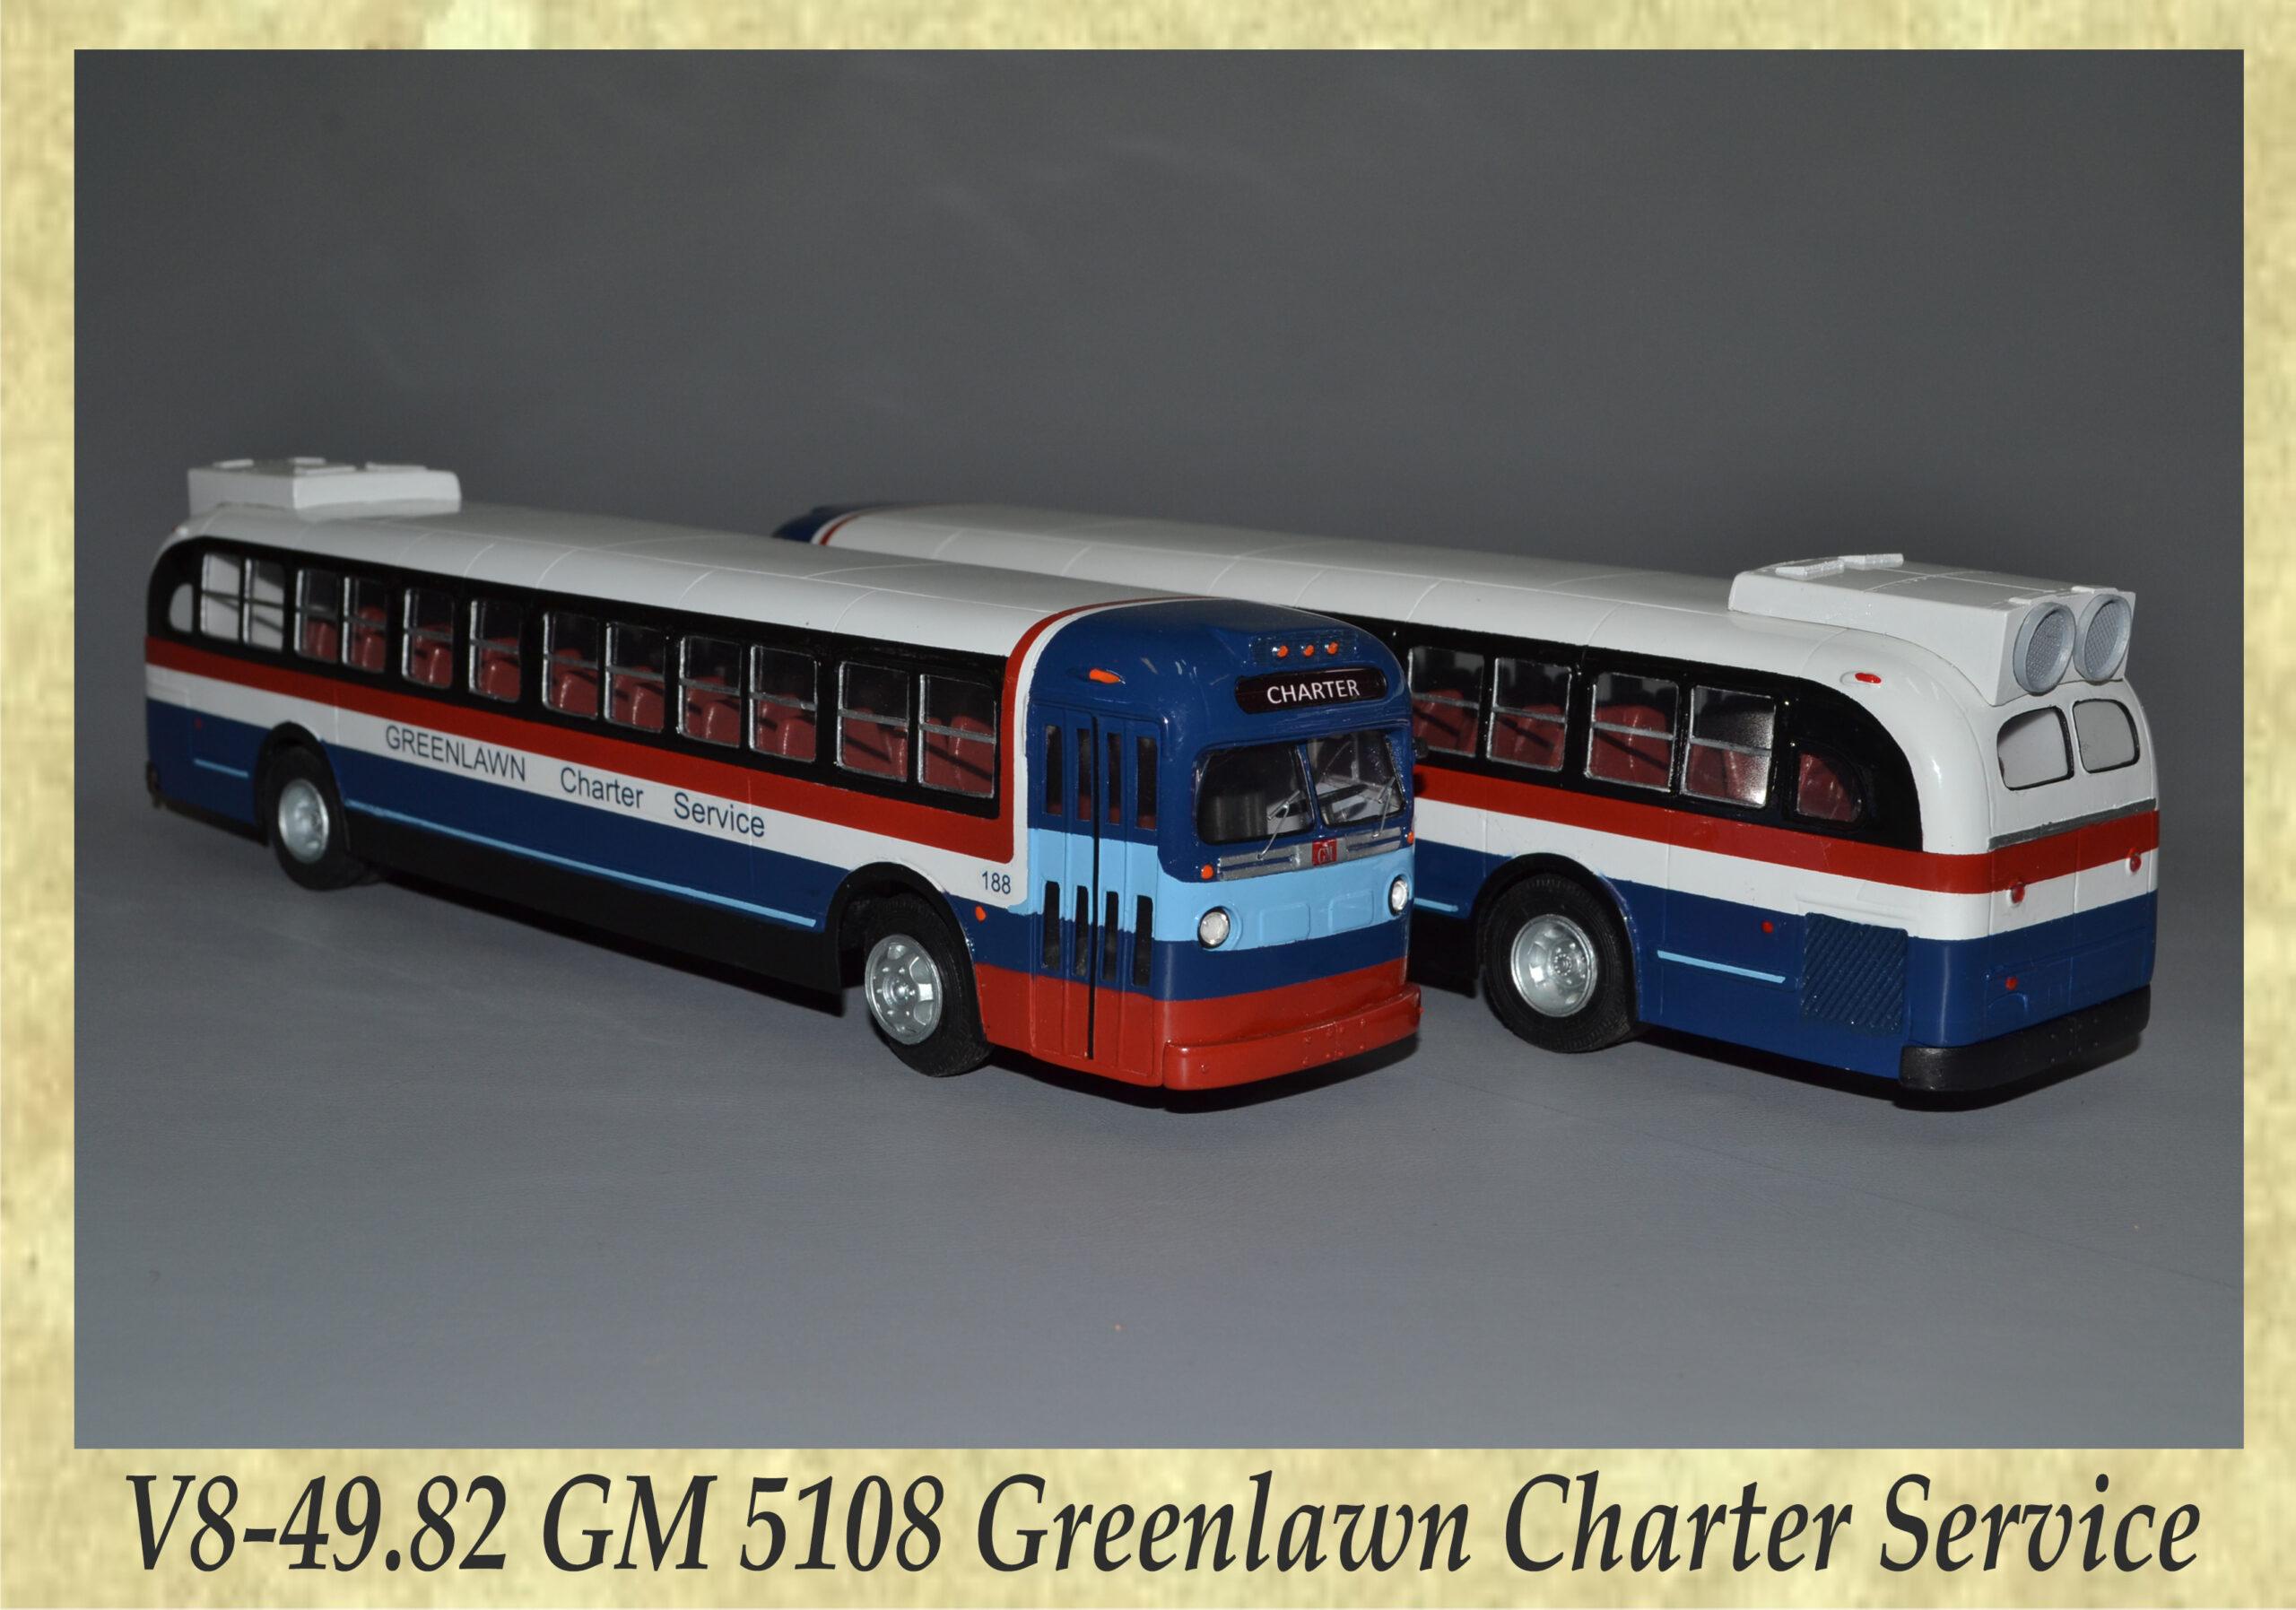 V8-49.82 GM 5108 Greenlawn Charter Service